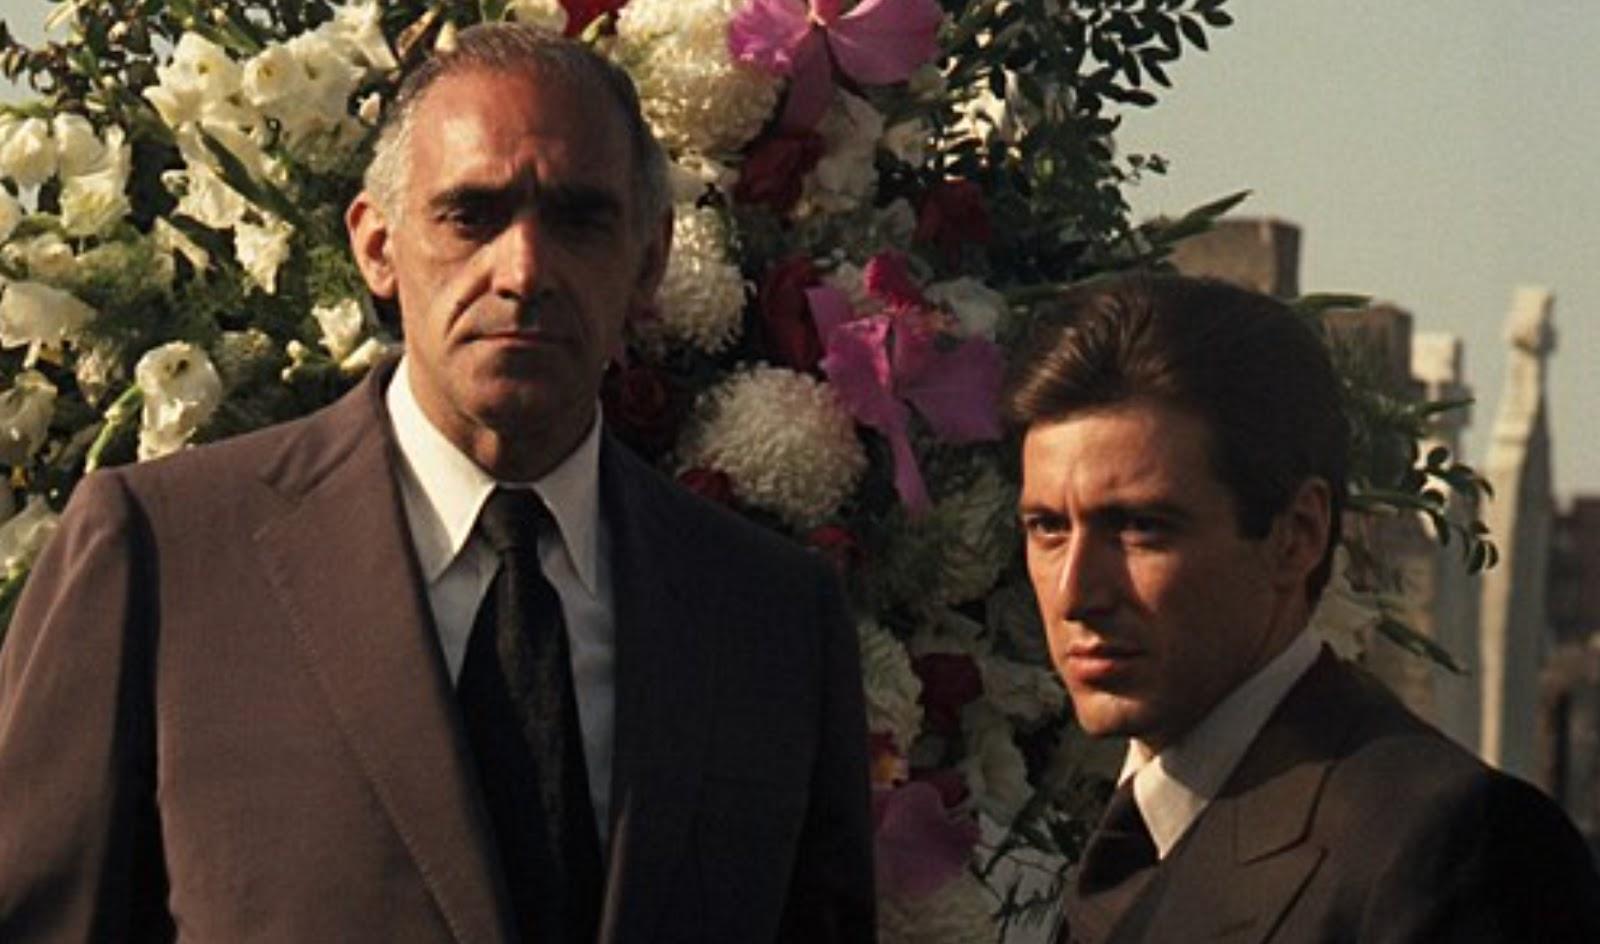 Abe Vigoda and Al Pacino star in The Godfather